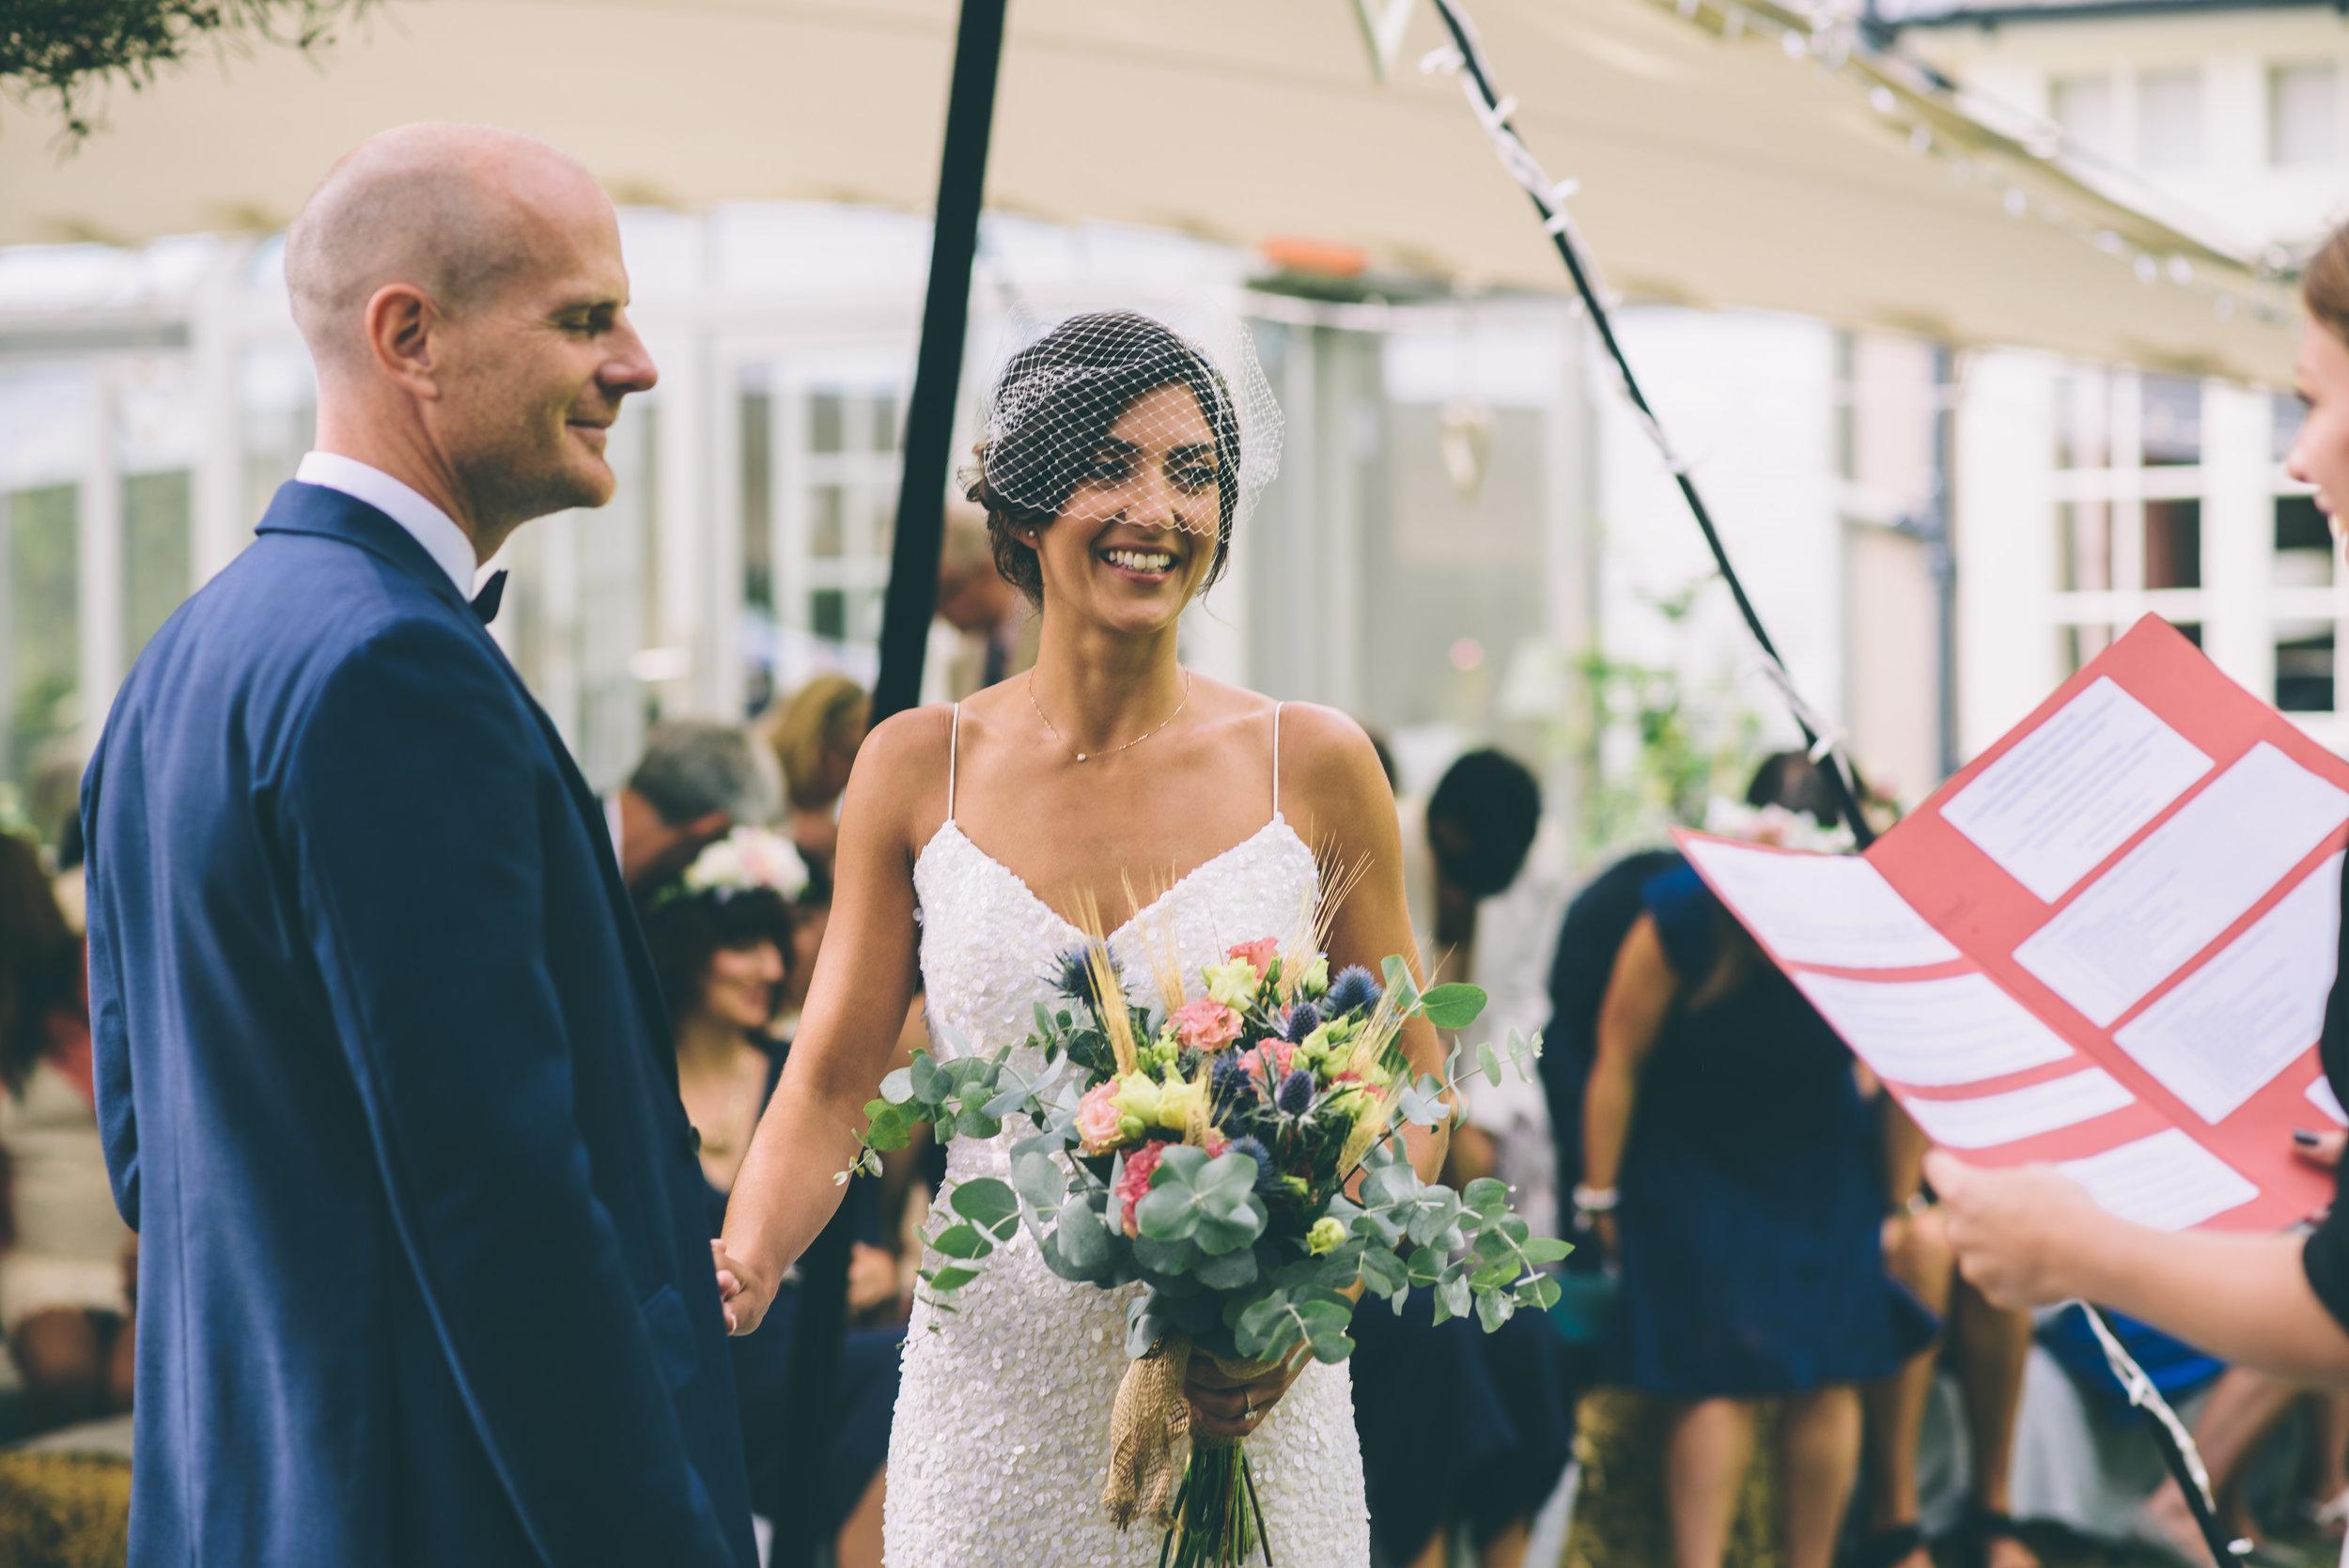 Garden Wedding photography Barley Herefordshire - Tracy + Matt -155.jpg